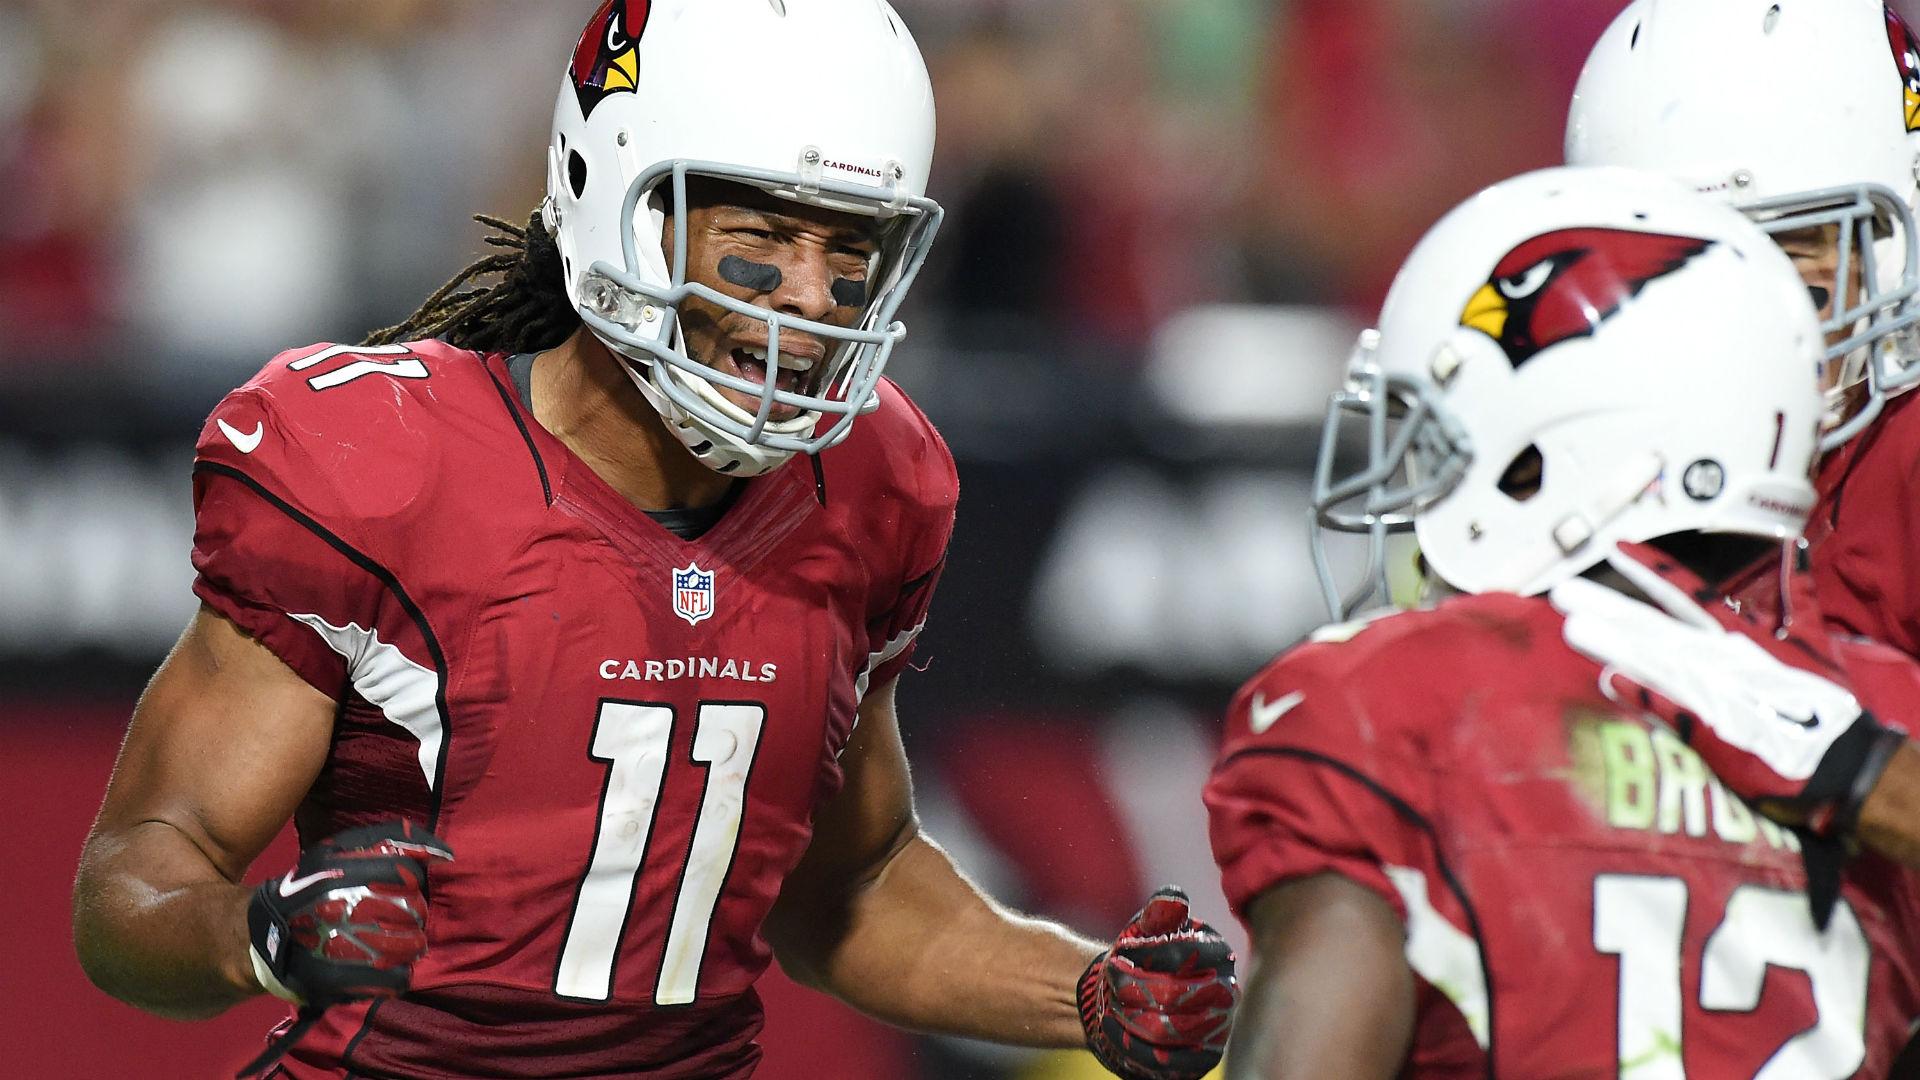 Cardinals receiver Larry Fitzgerald